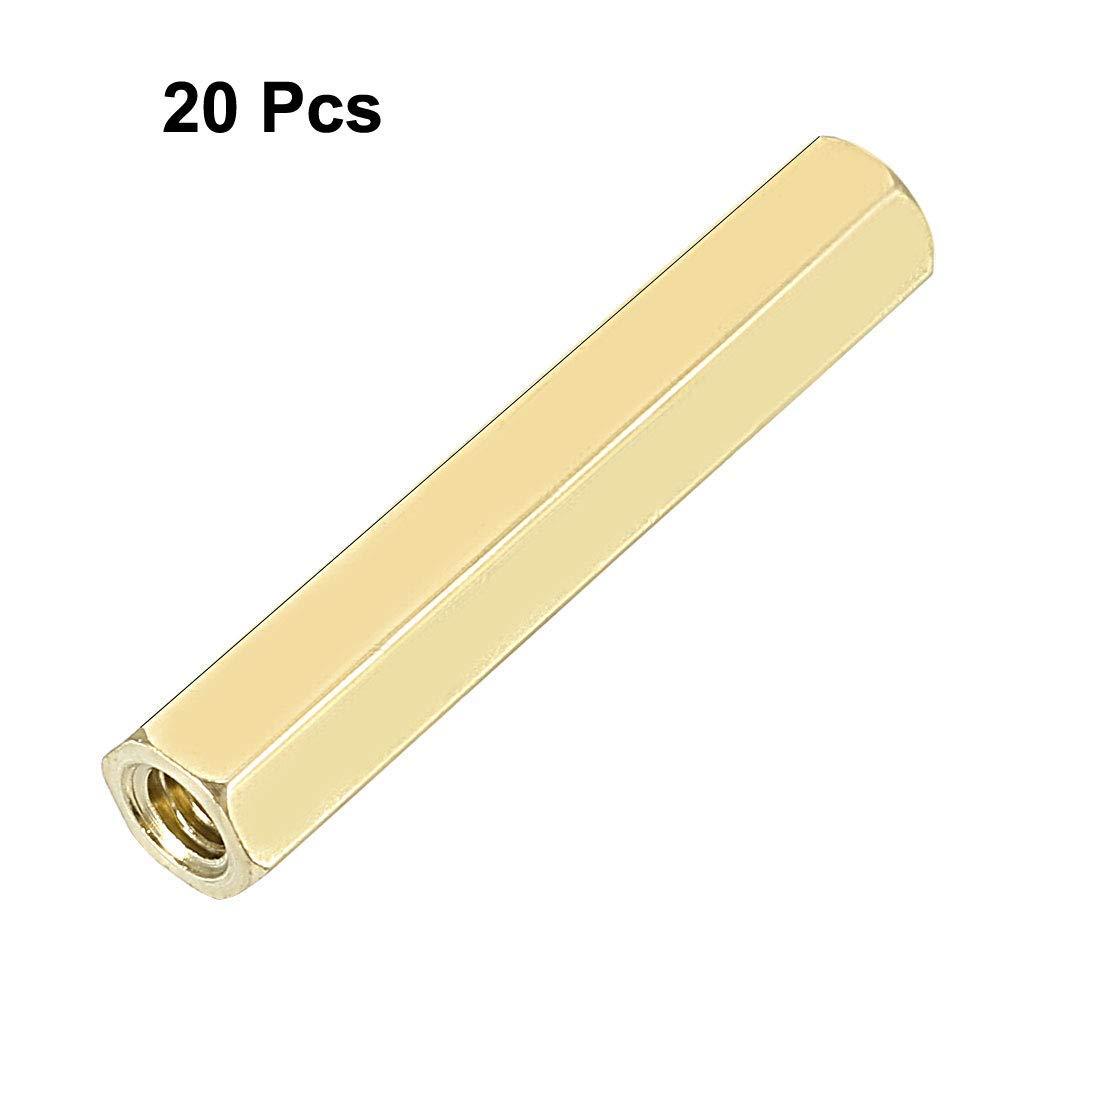 20pcs Brass Pillar Straight PCB Female Thread Hexagonal Separator Separator M3x5x27mm